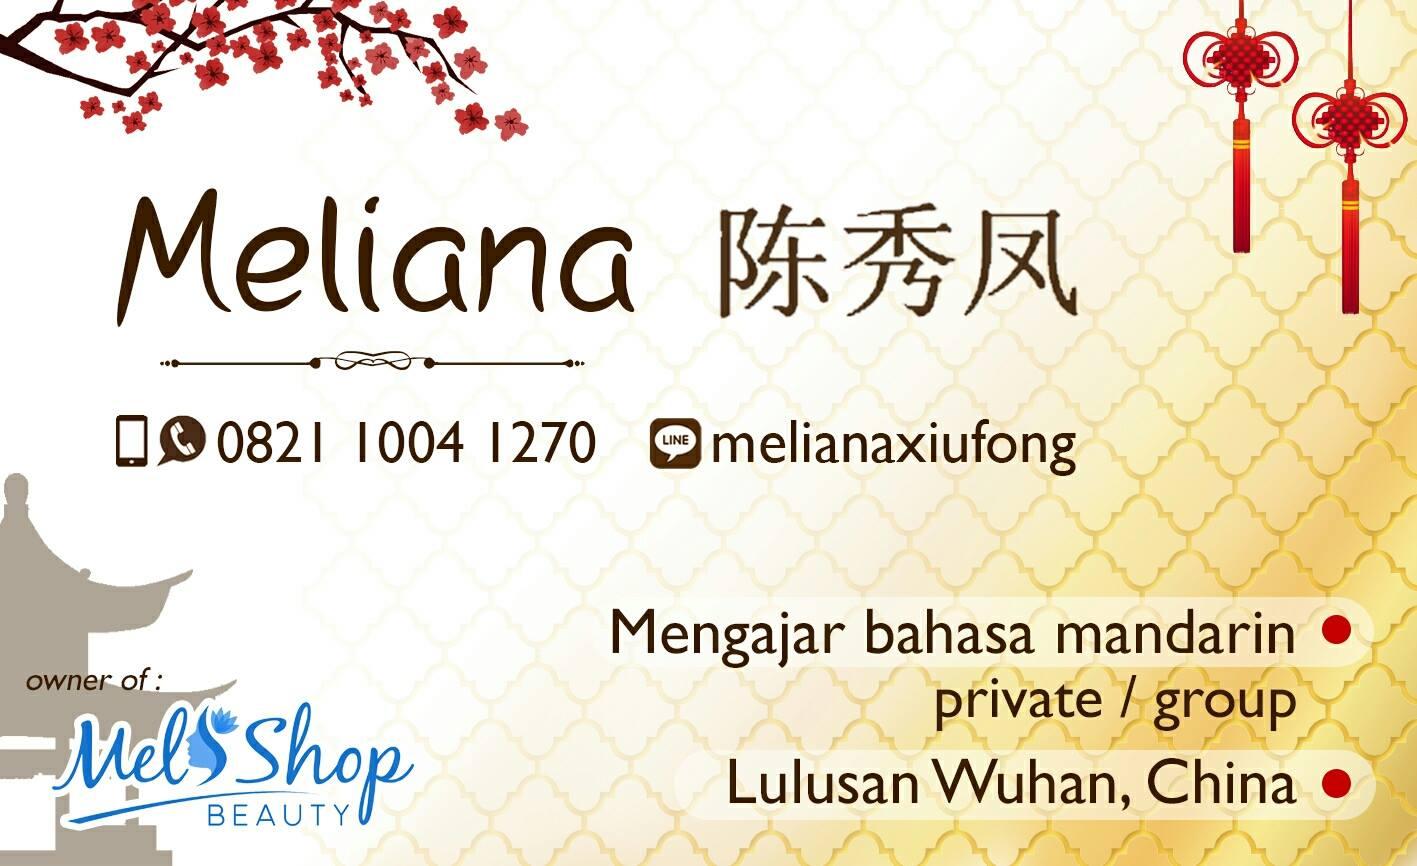 Kursus Mandarin di Serpong